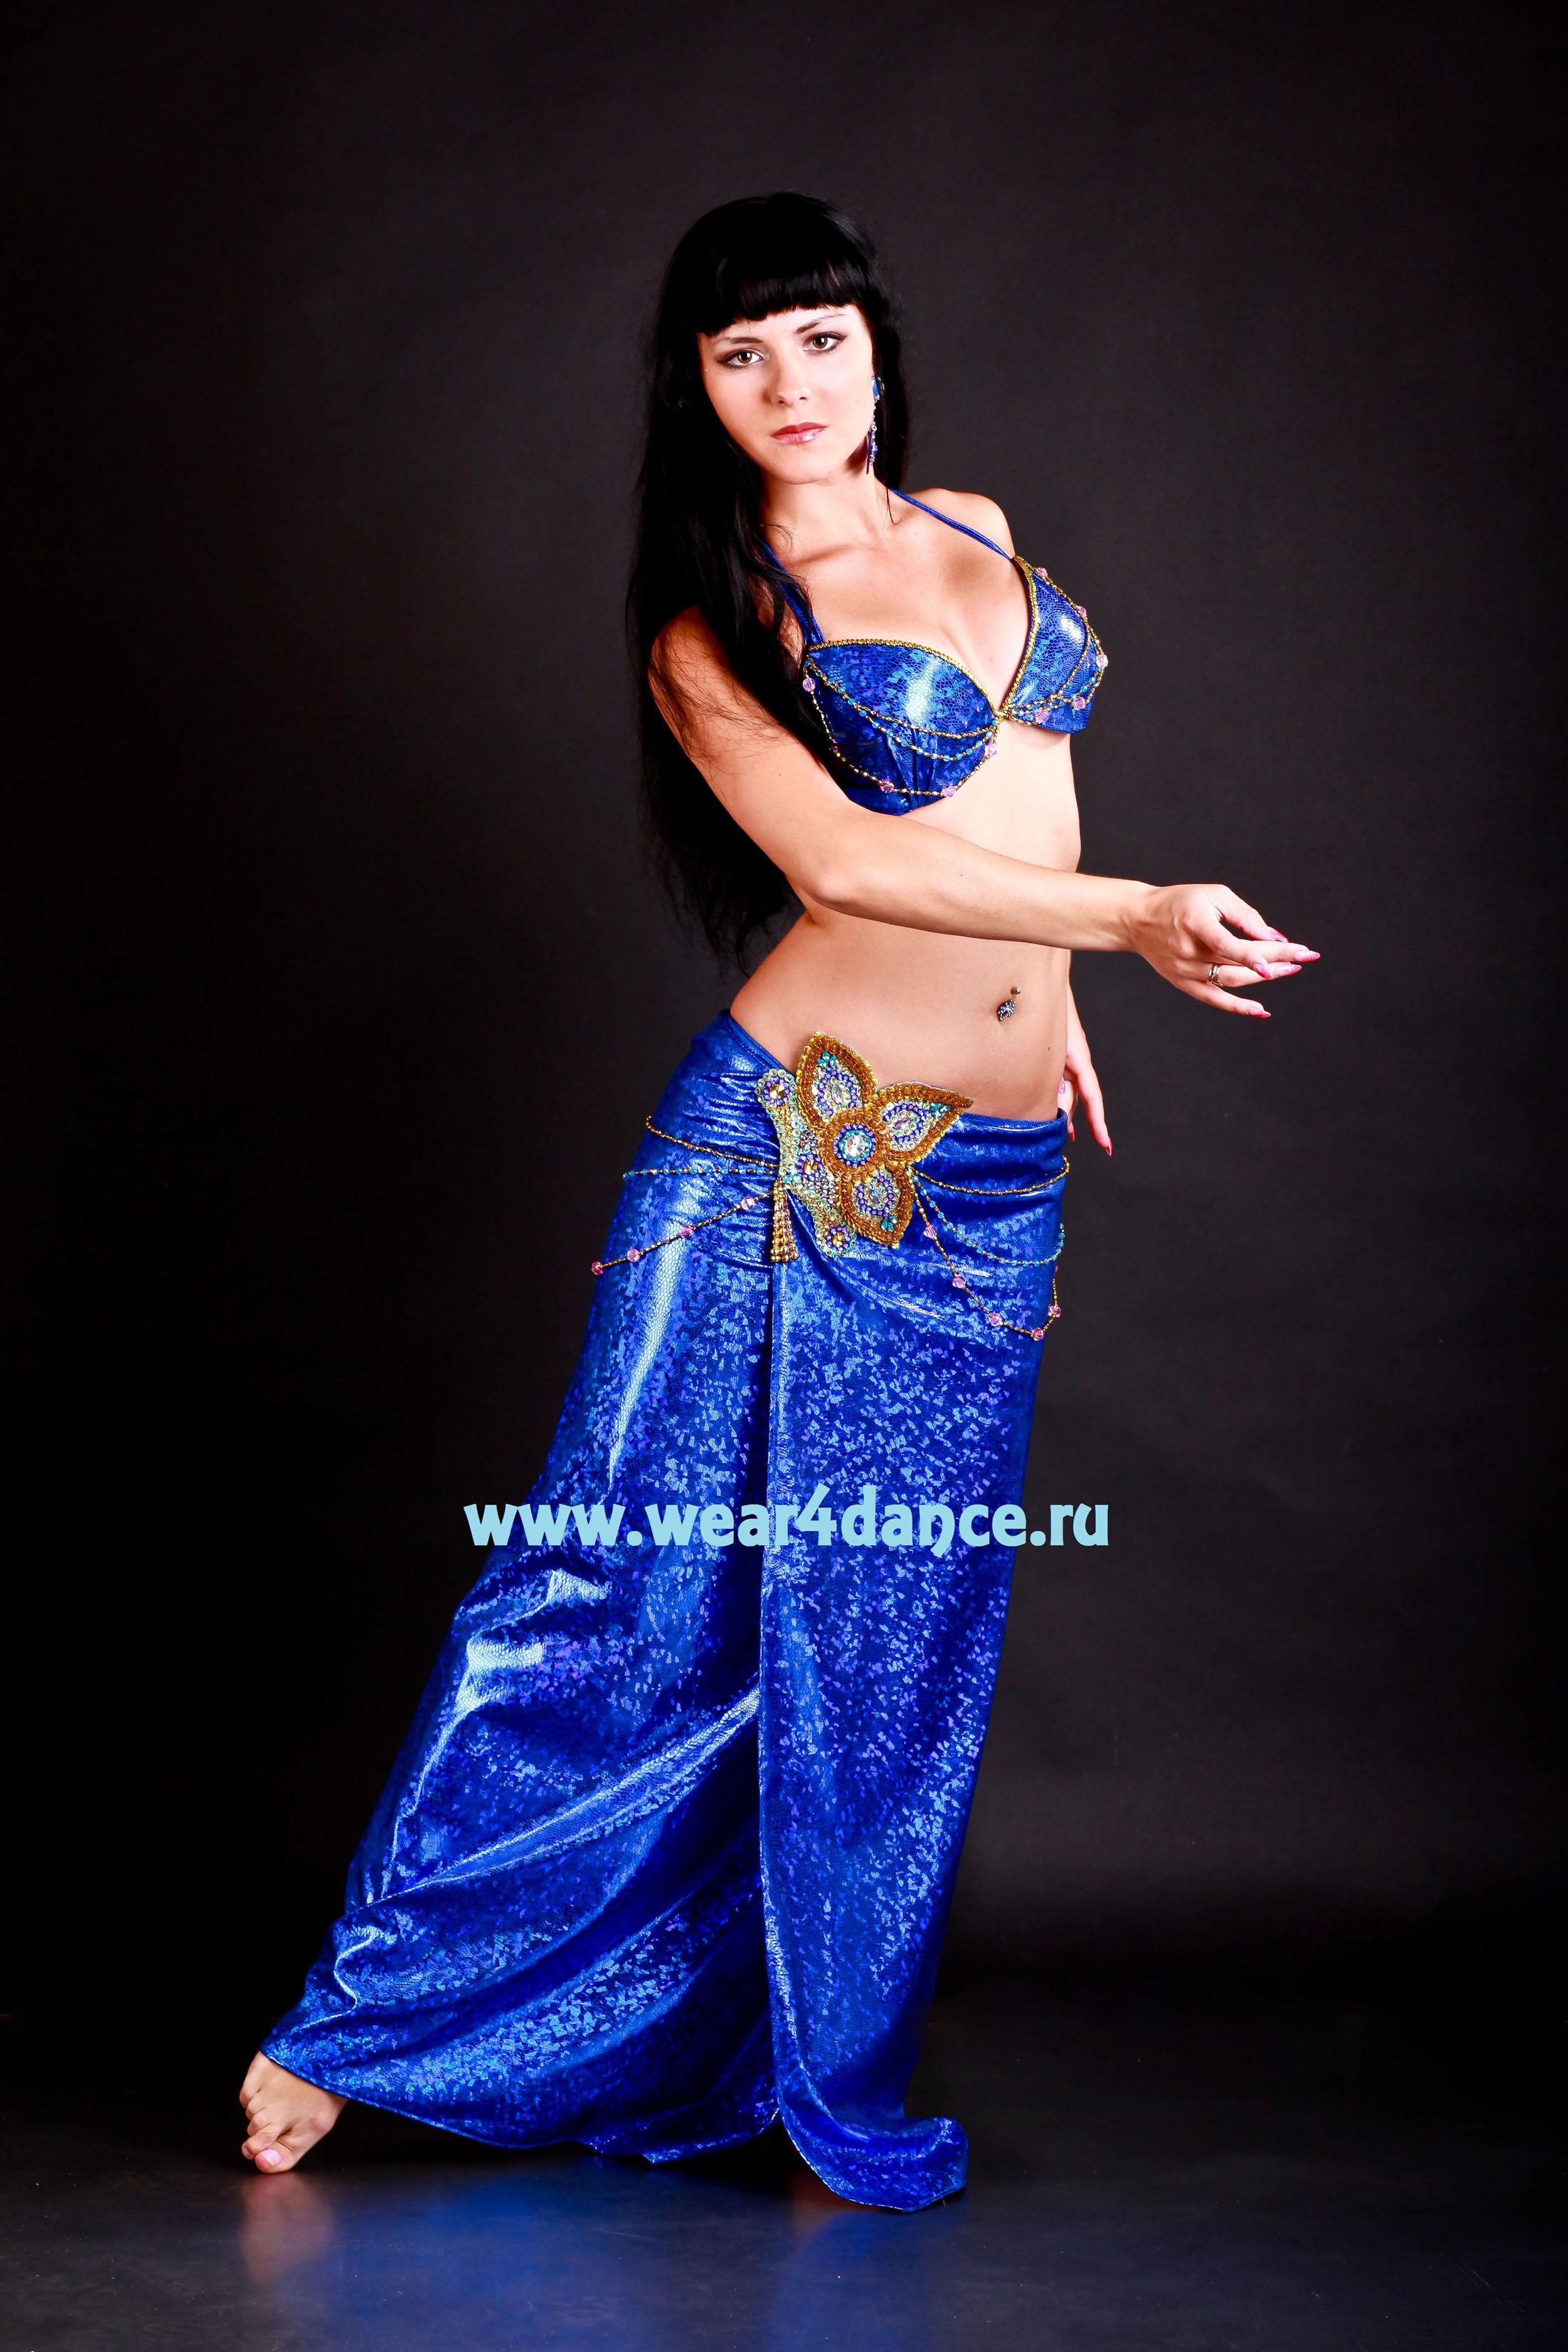 Юбке танцует стриптиз 30 фотография